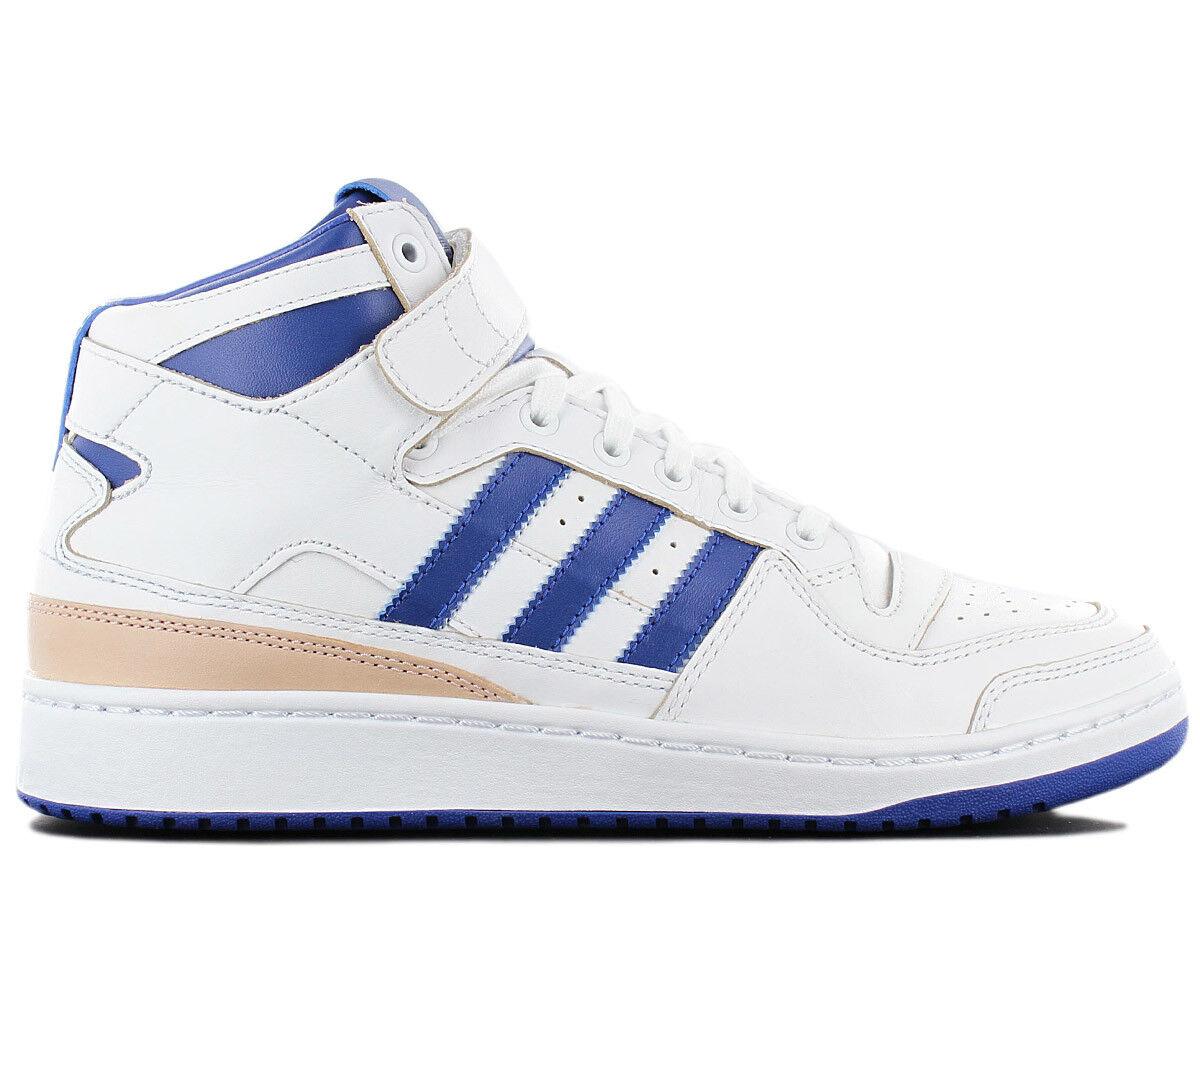 Adidas Originals  Forum mid (Wrap) Bounce Men's scarpe da ginnastica Scarpe BY4412 scarpe da ginnastica s  vendita all'ingrosso